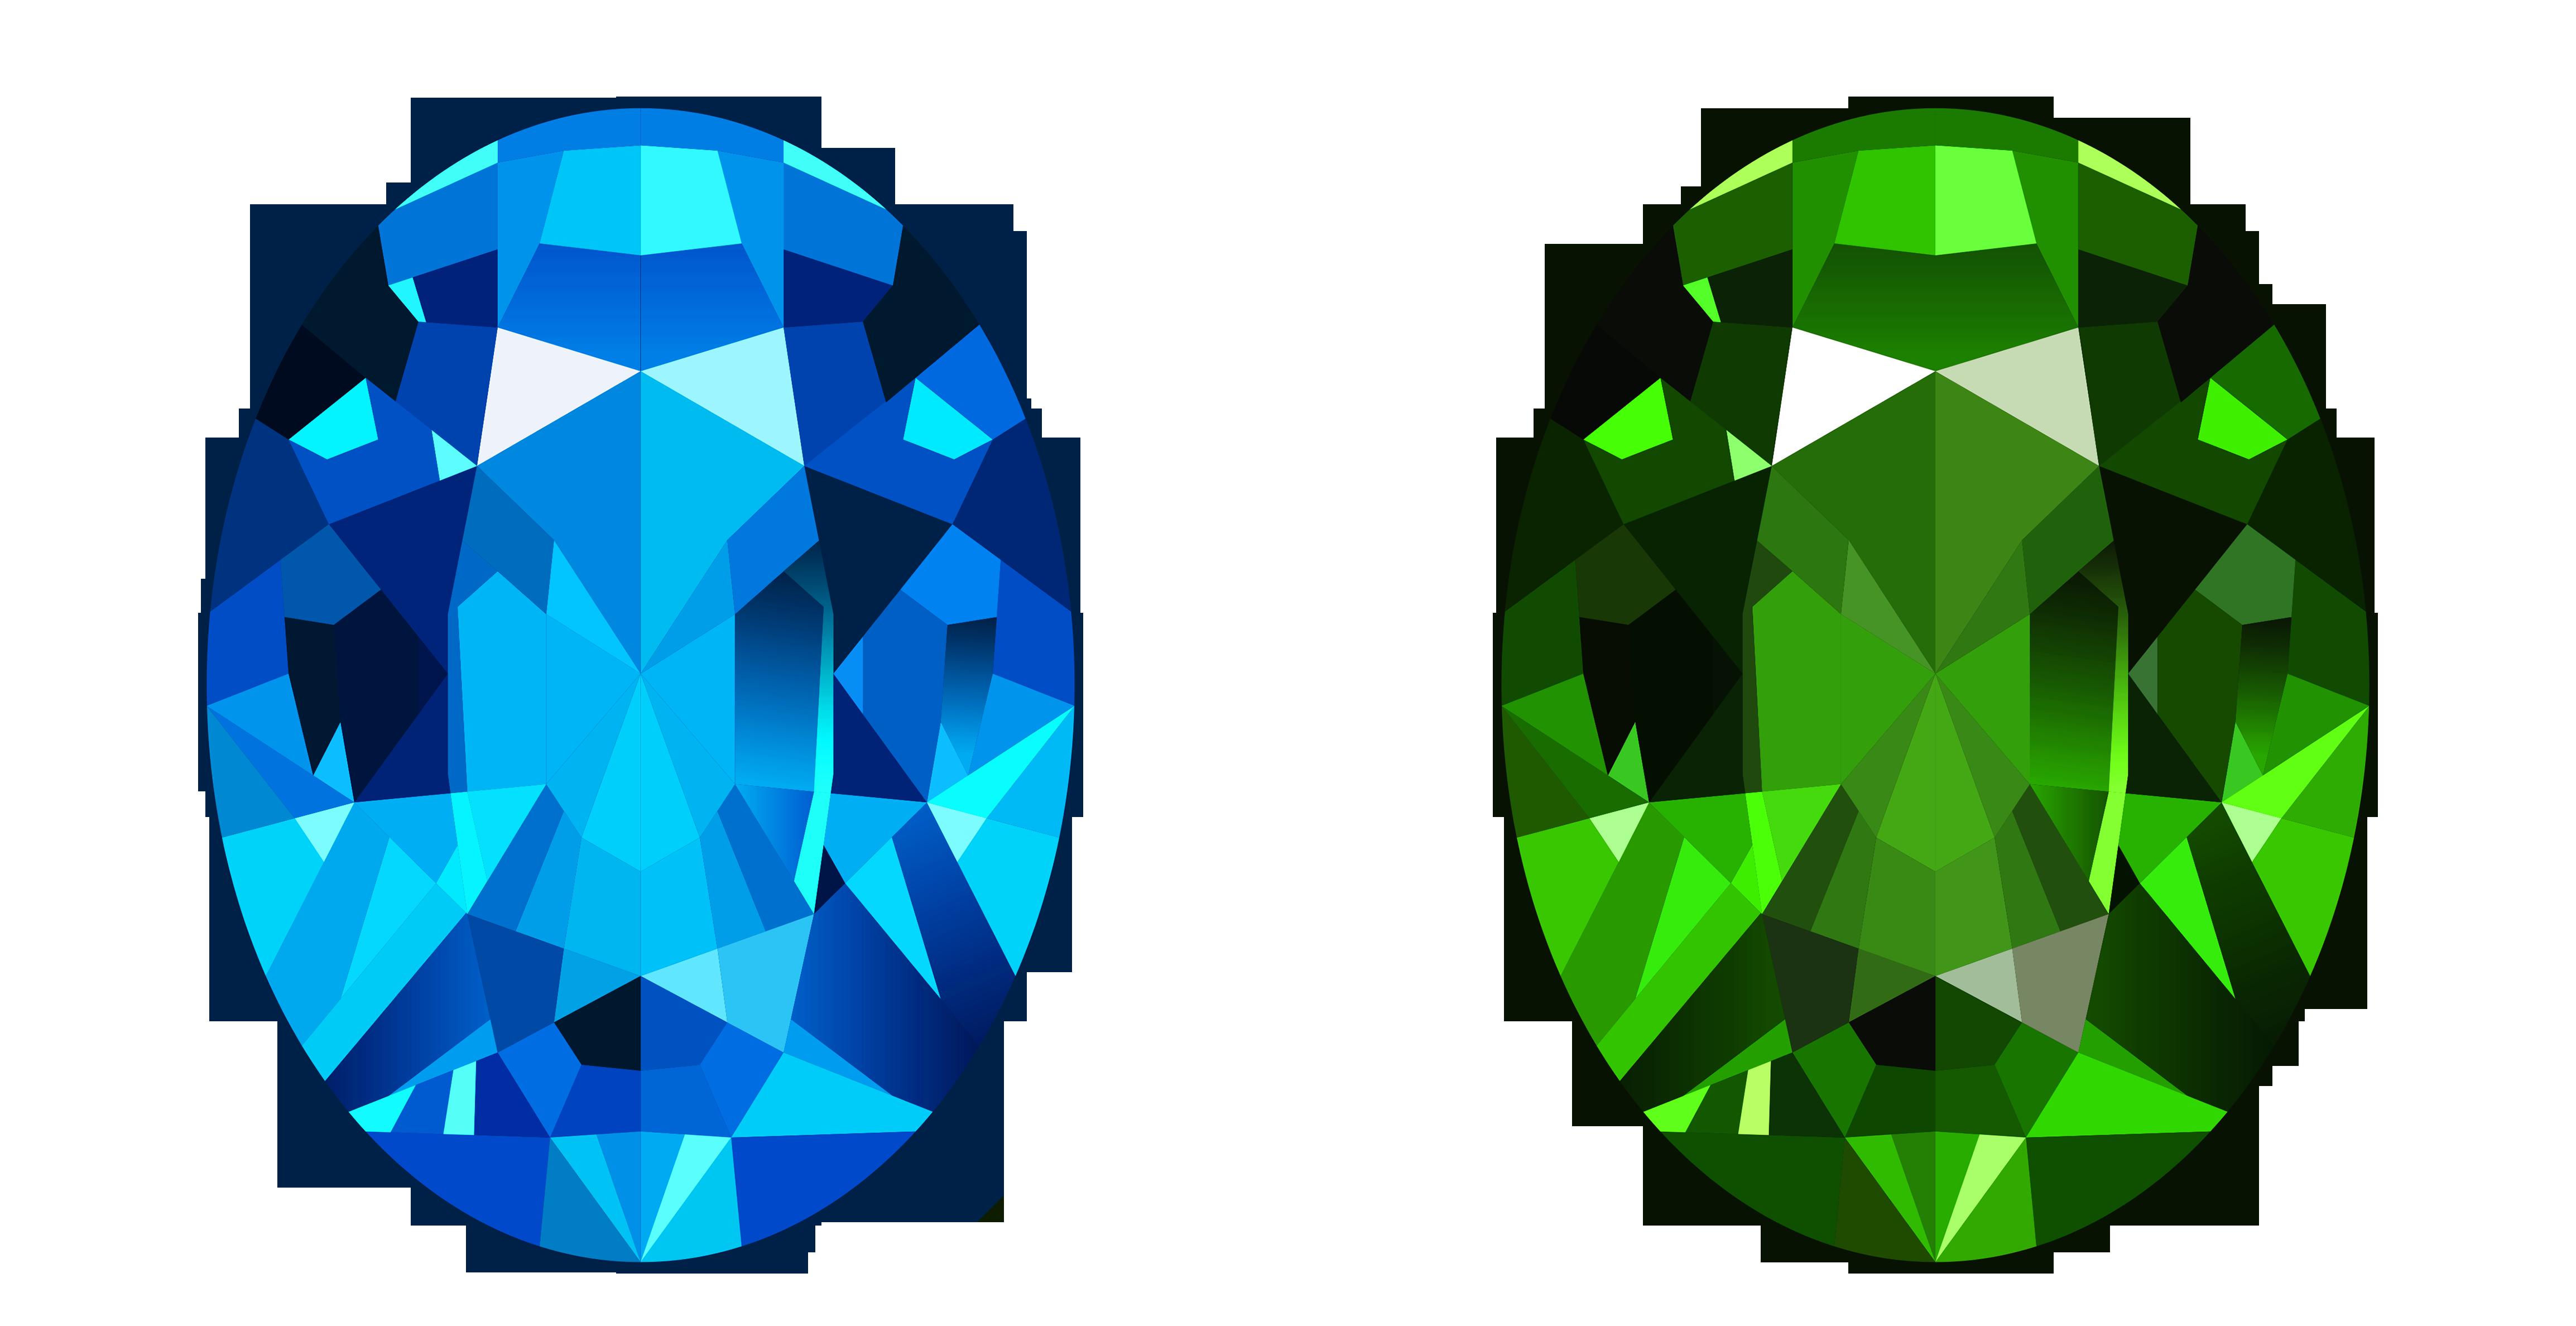 Diamond clipart cartoon. Transparent blue and green